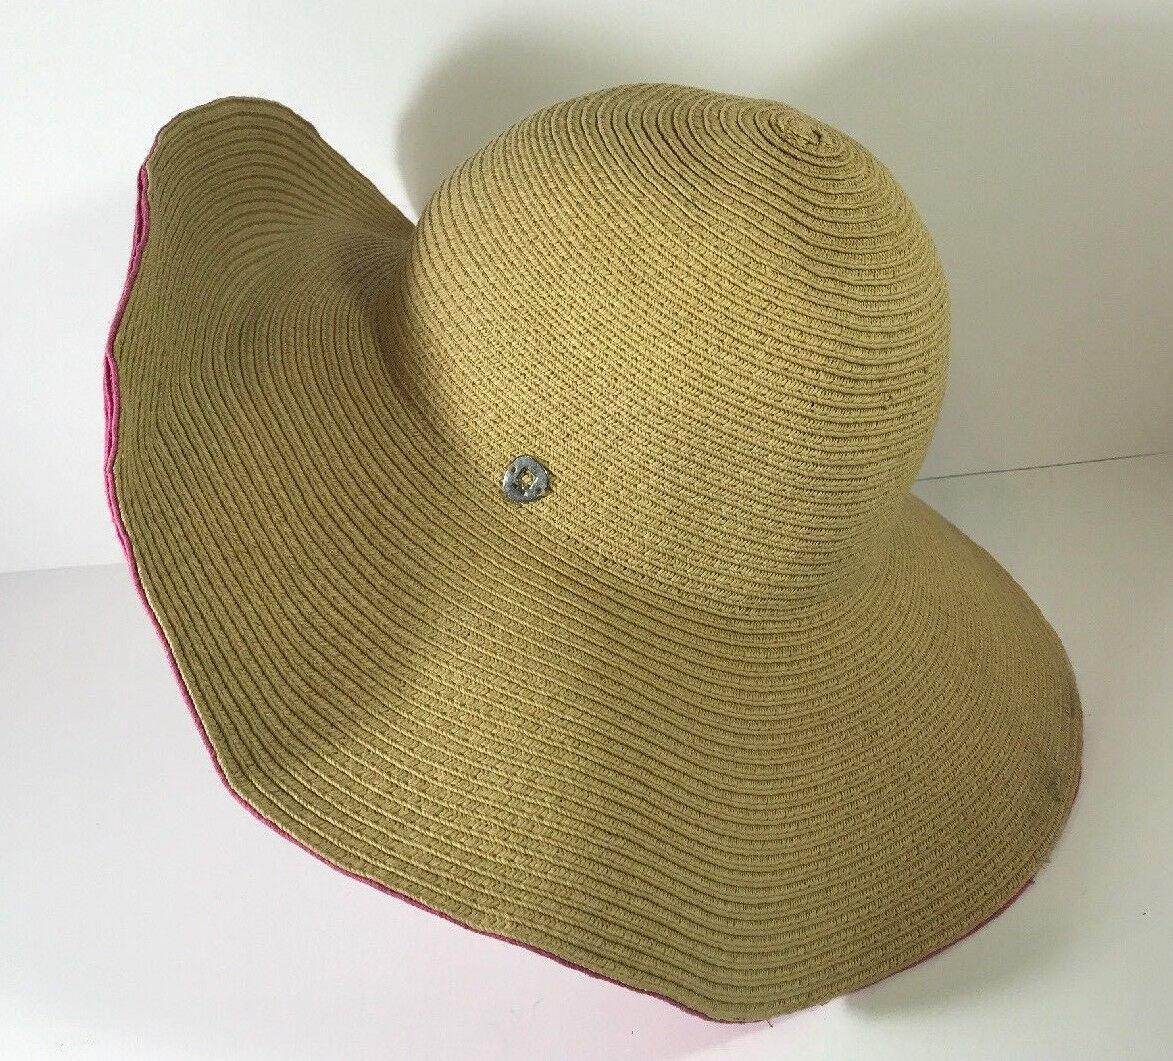 DSY Floppy Hat 100% Paper Straw Classic Straw Hot… - image 5